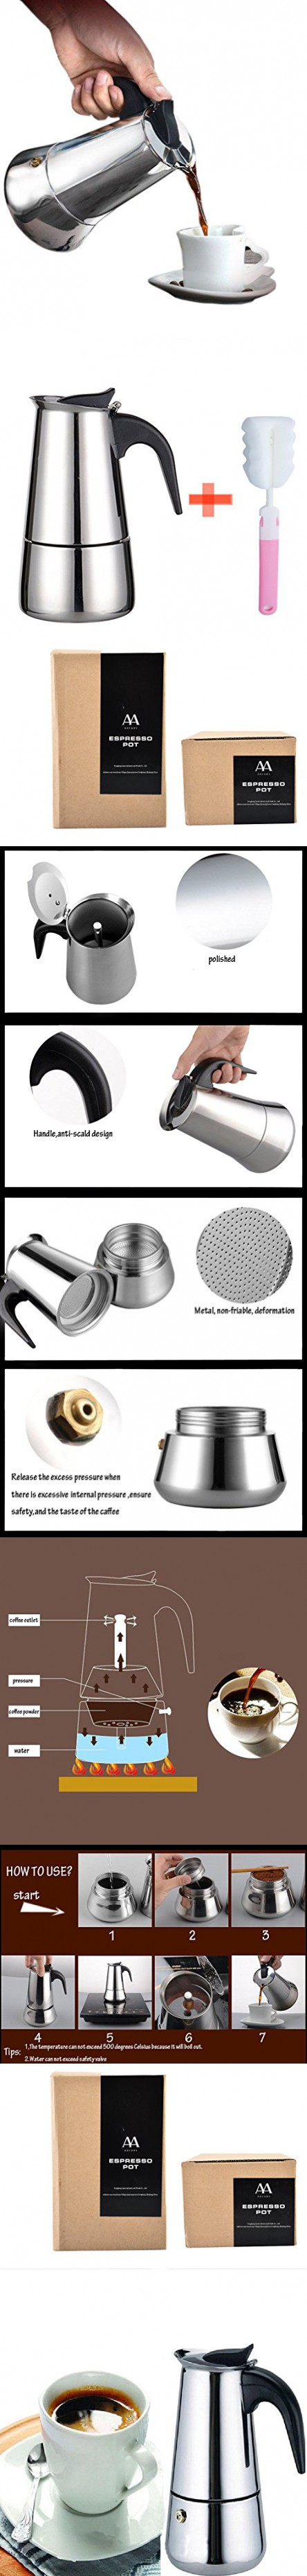 Generic ml cup moka coffee potstainless steel stovetop